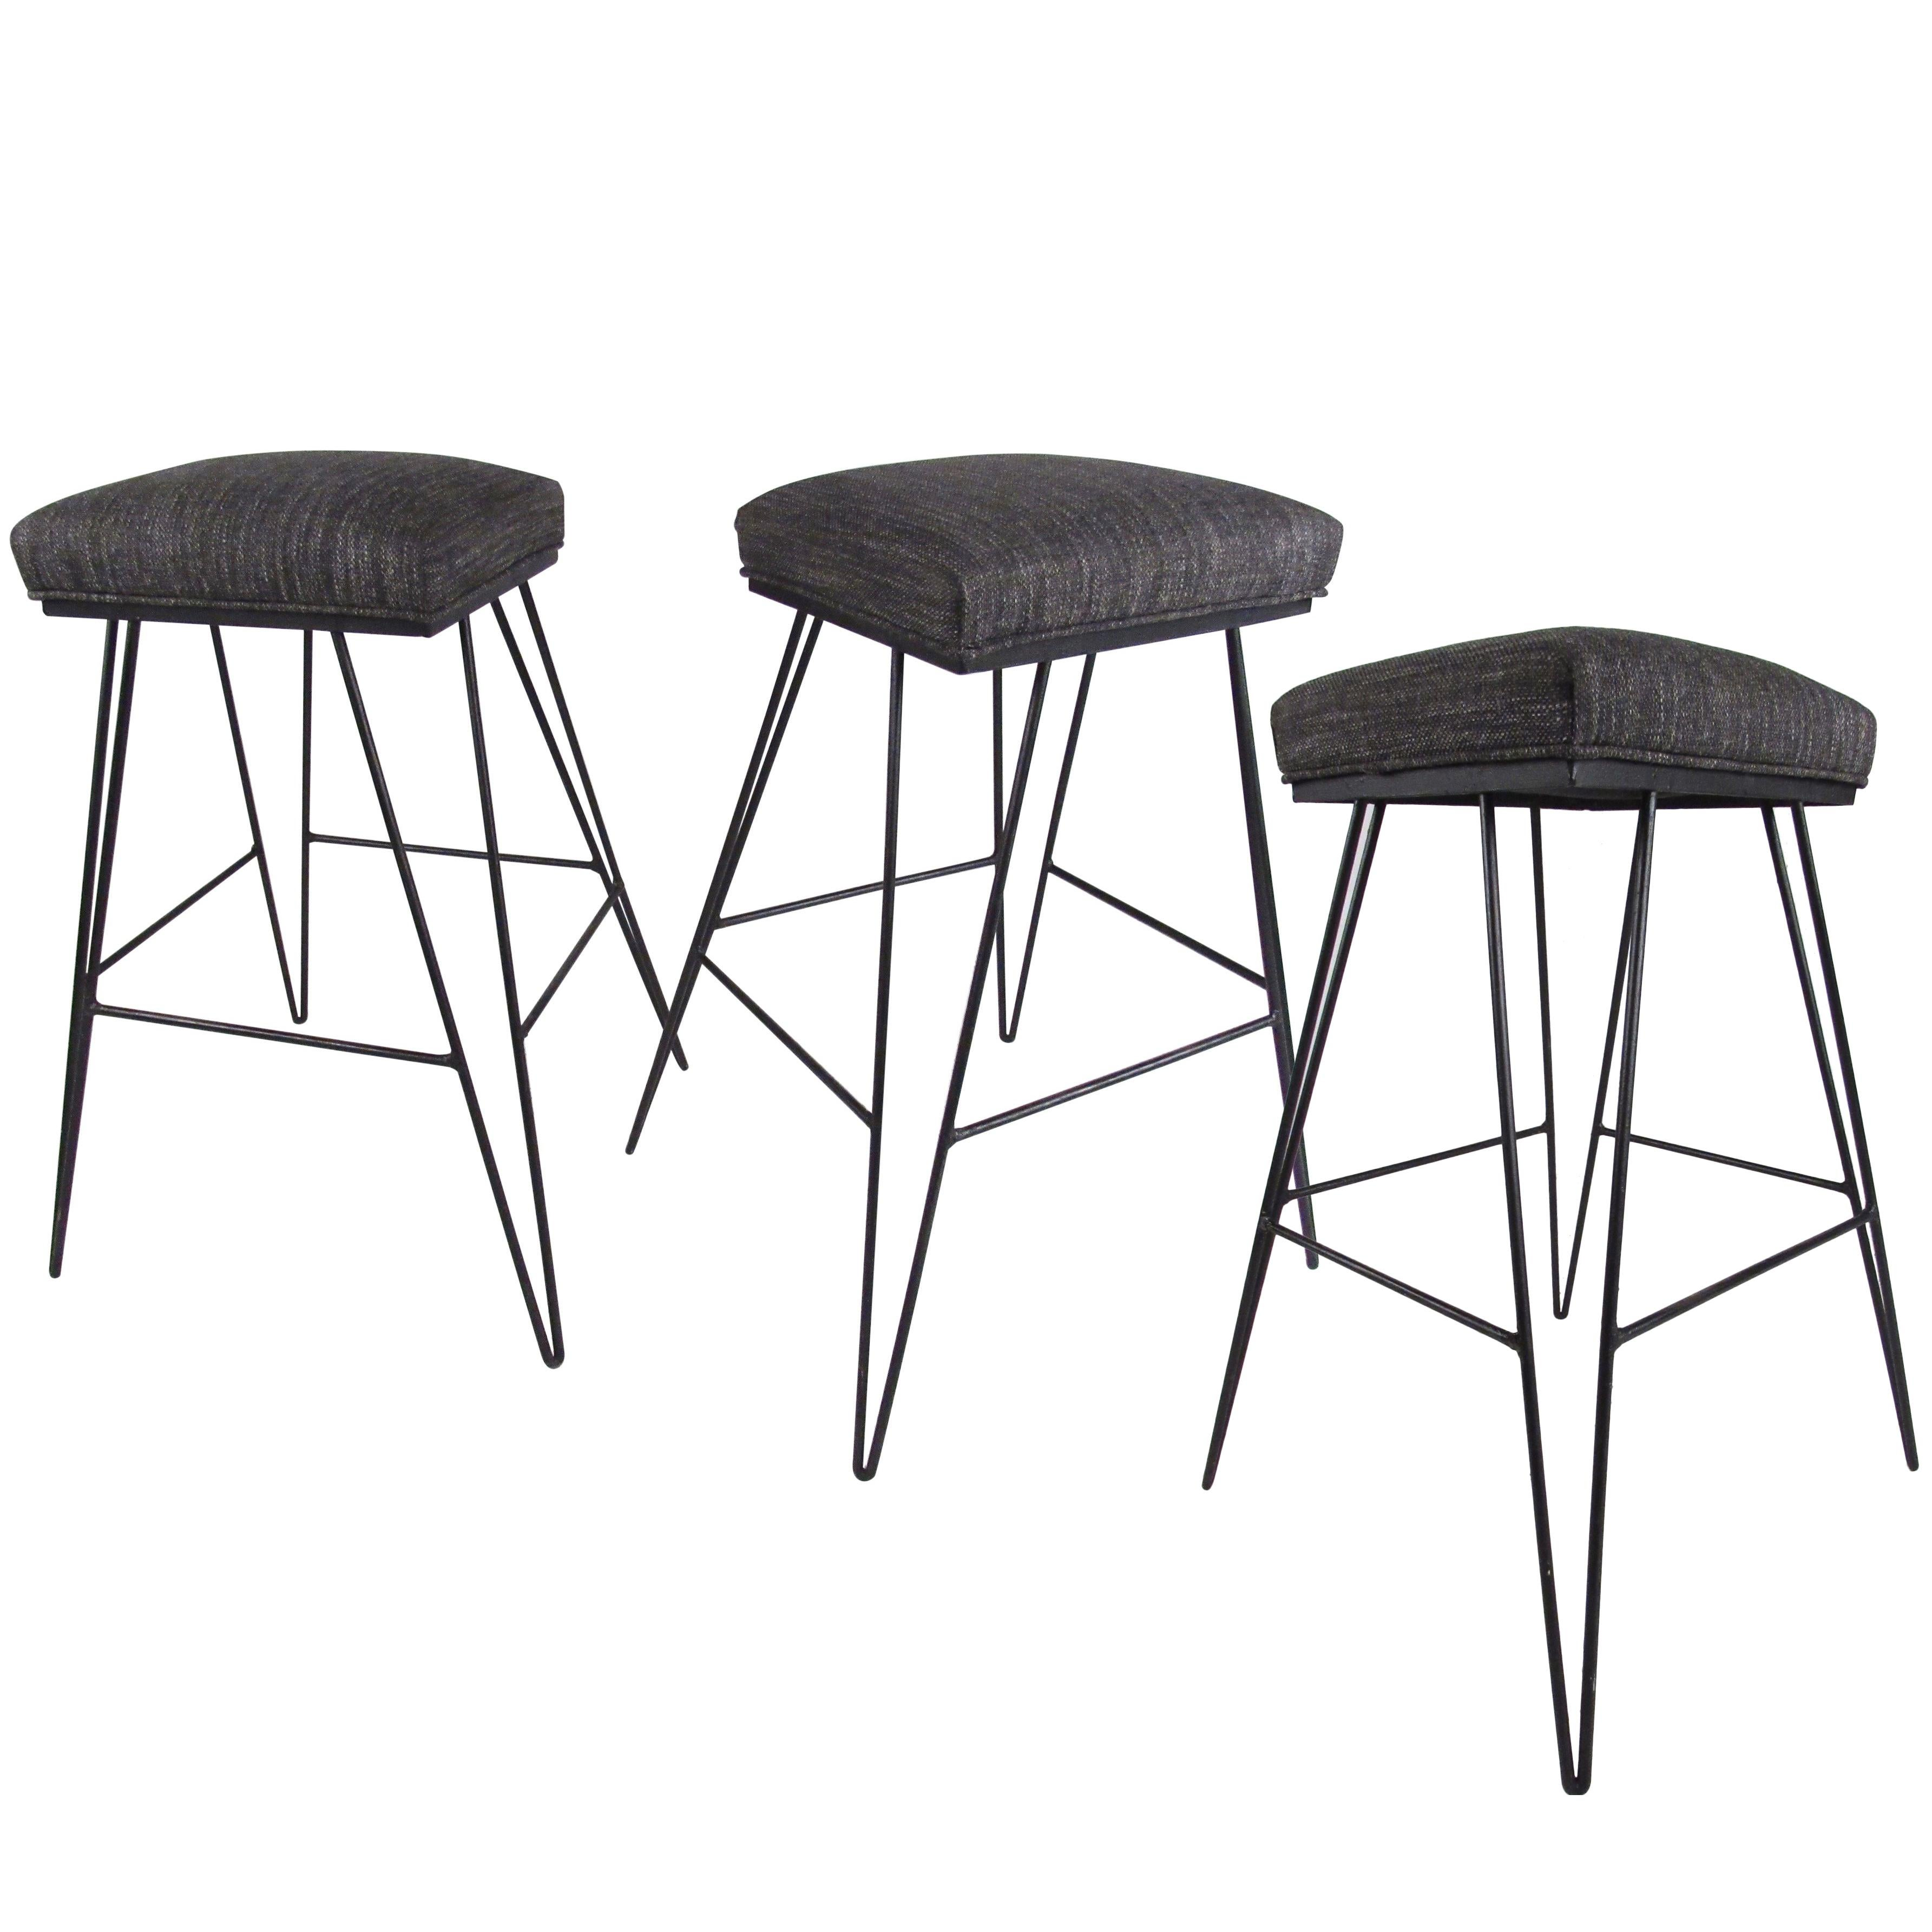 Set of Midcentury Hairpin Barstools